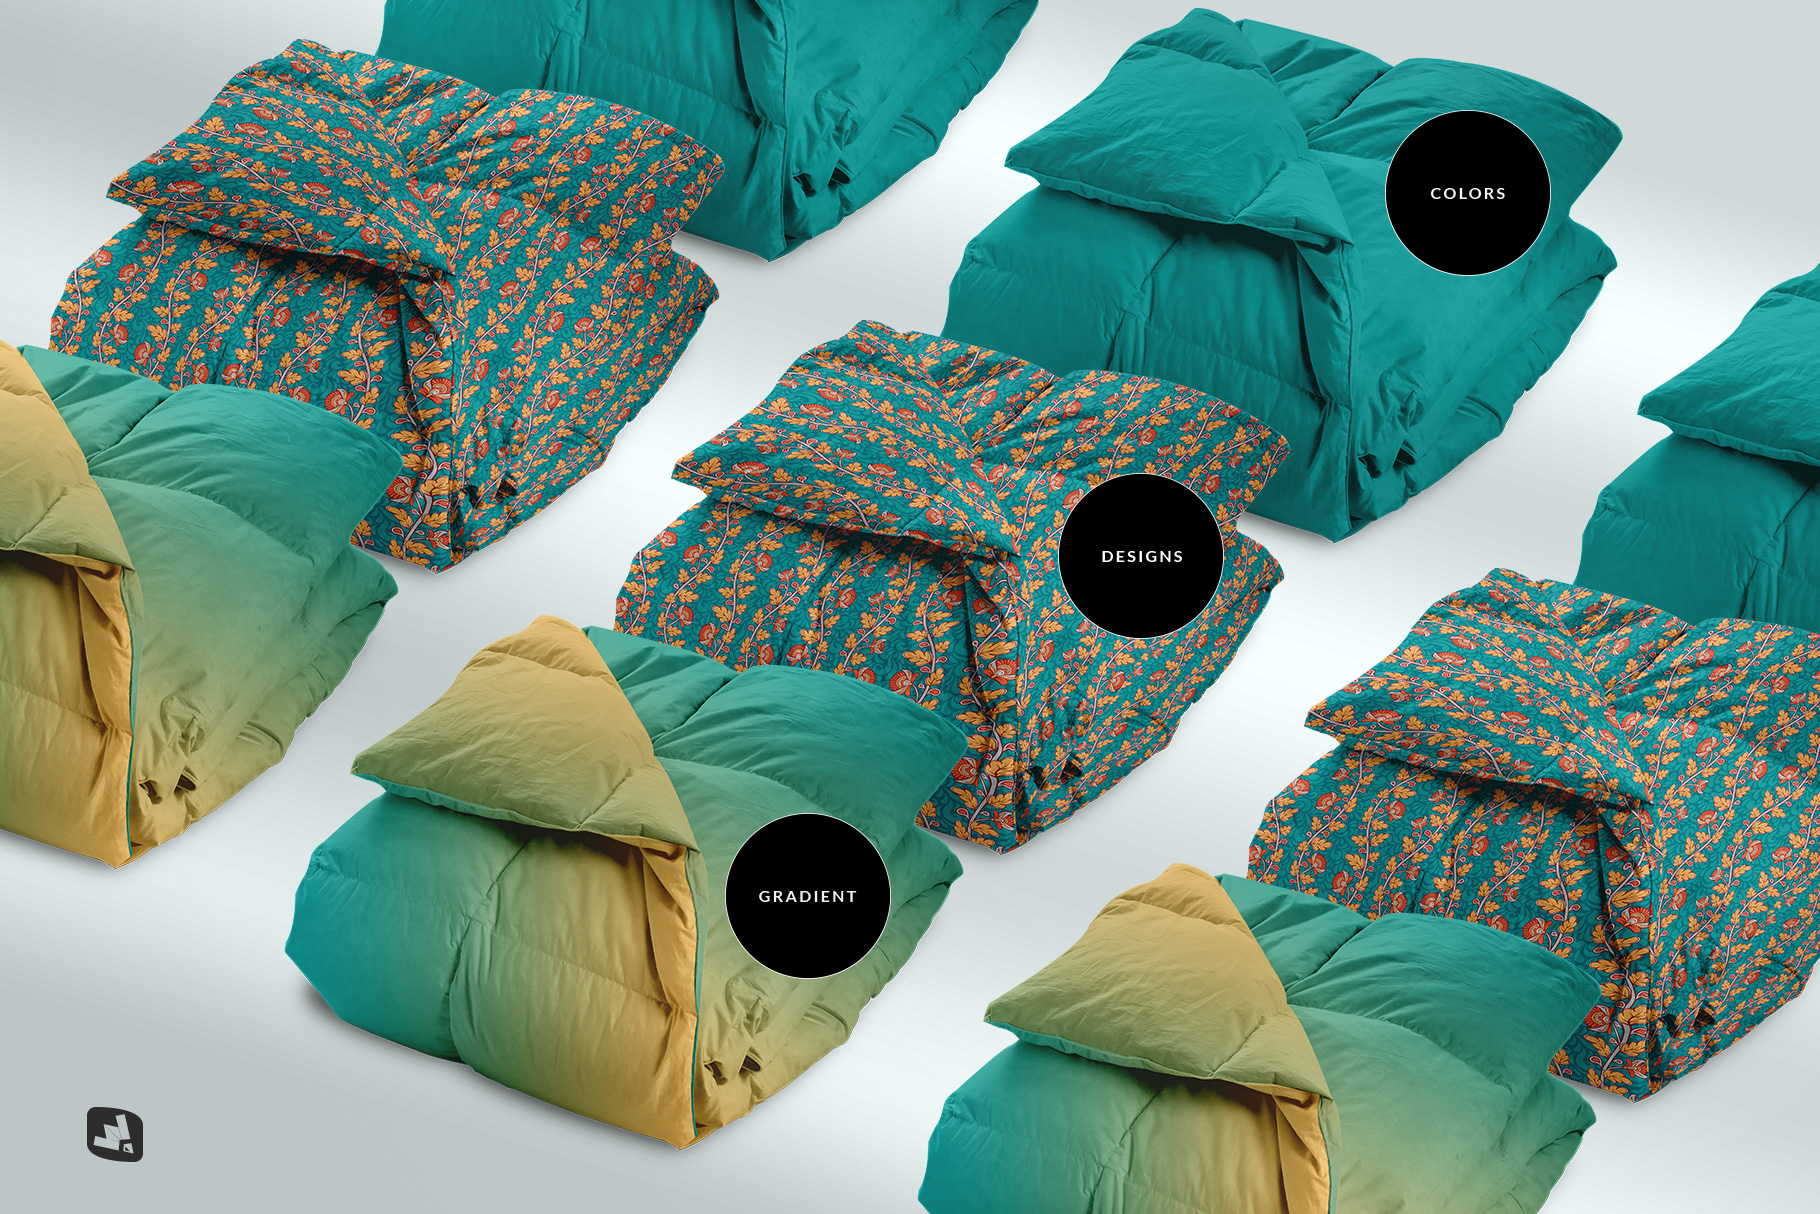 types of the folded comforter blanket mockup